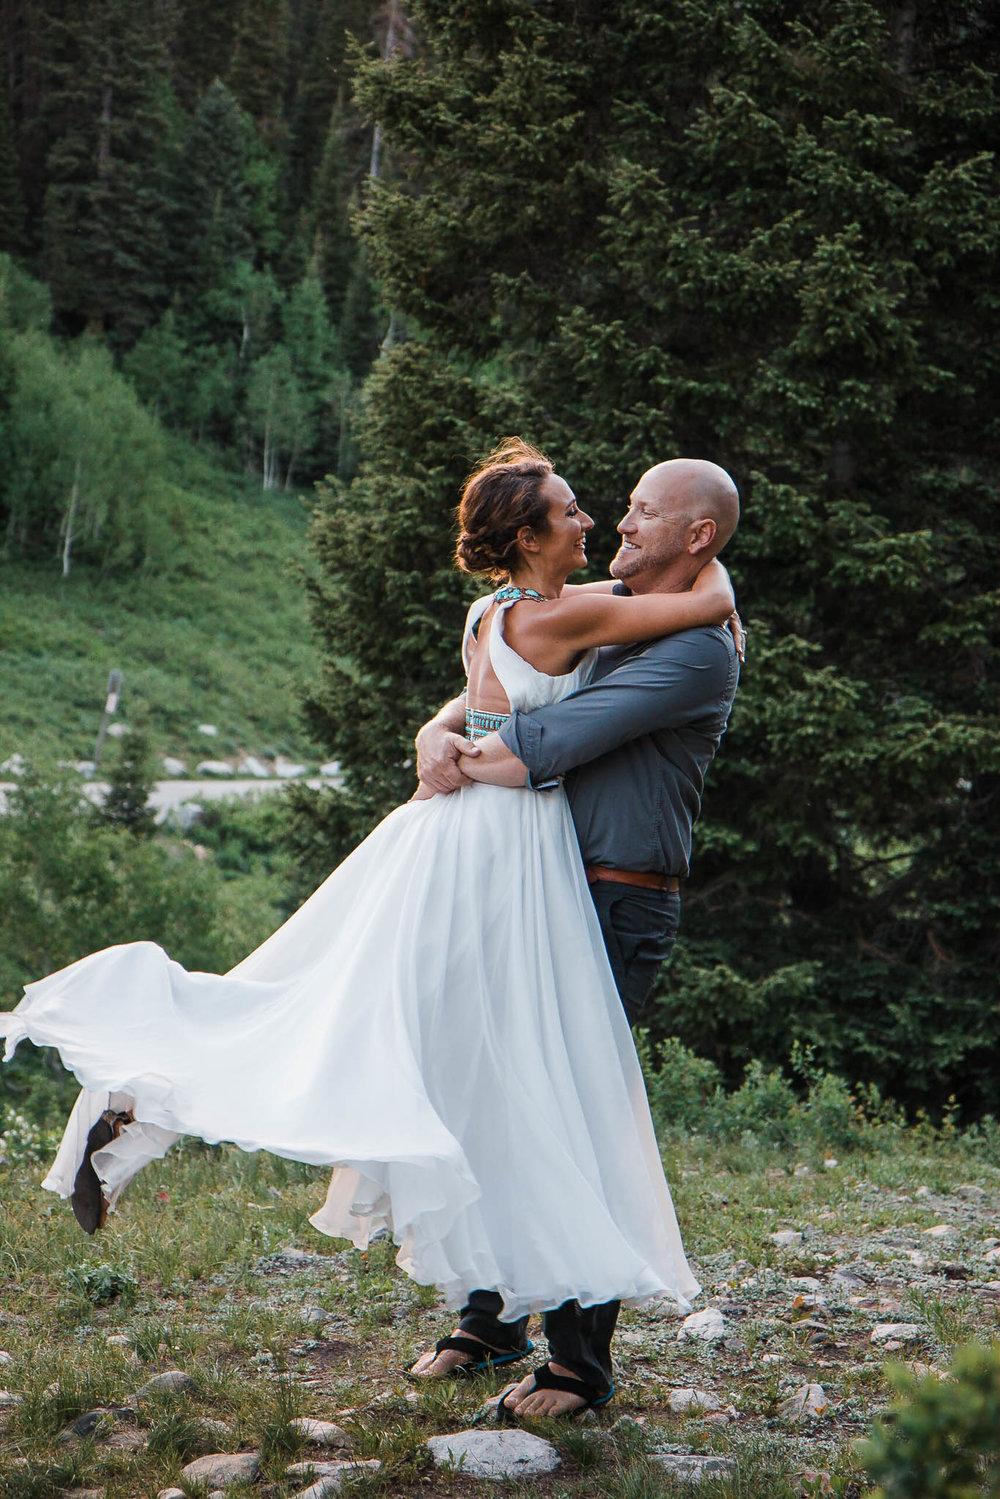 Husband spins wife in a flowy dress skirt during their adventure vow renewal in Jordan Pines, Utah